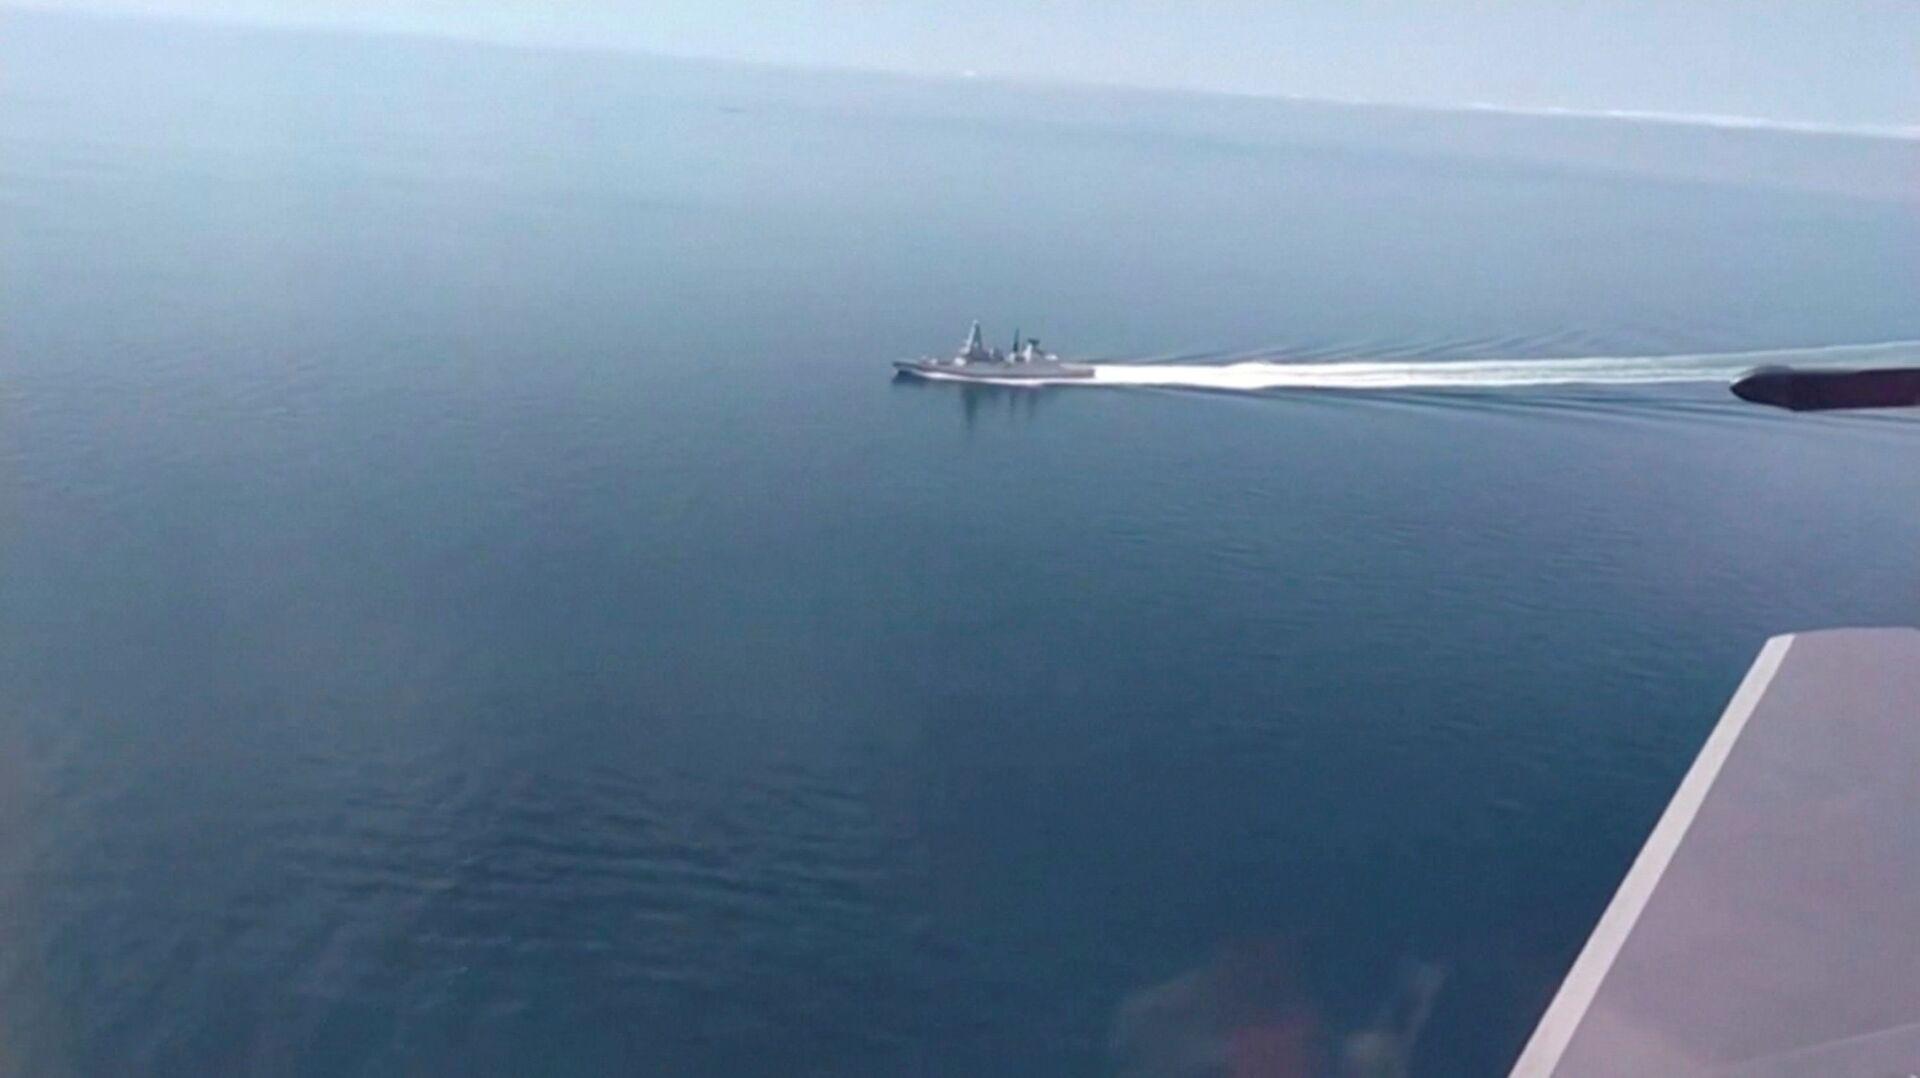 NATO's Largest-Ever 'Sea Breeze' Naval Drills Begin in Black Sea Amid HMS Defender Fracas - Sputnik International, 1920, 29.06.2021